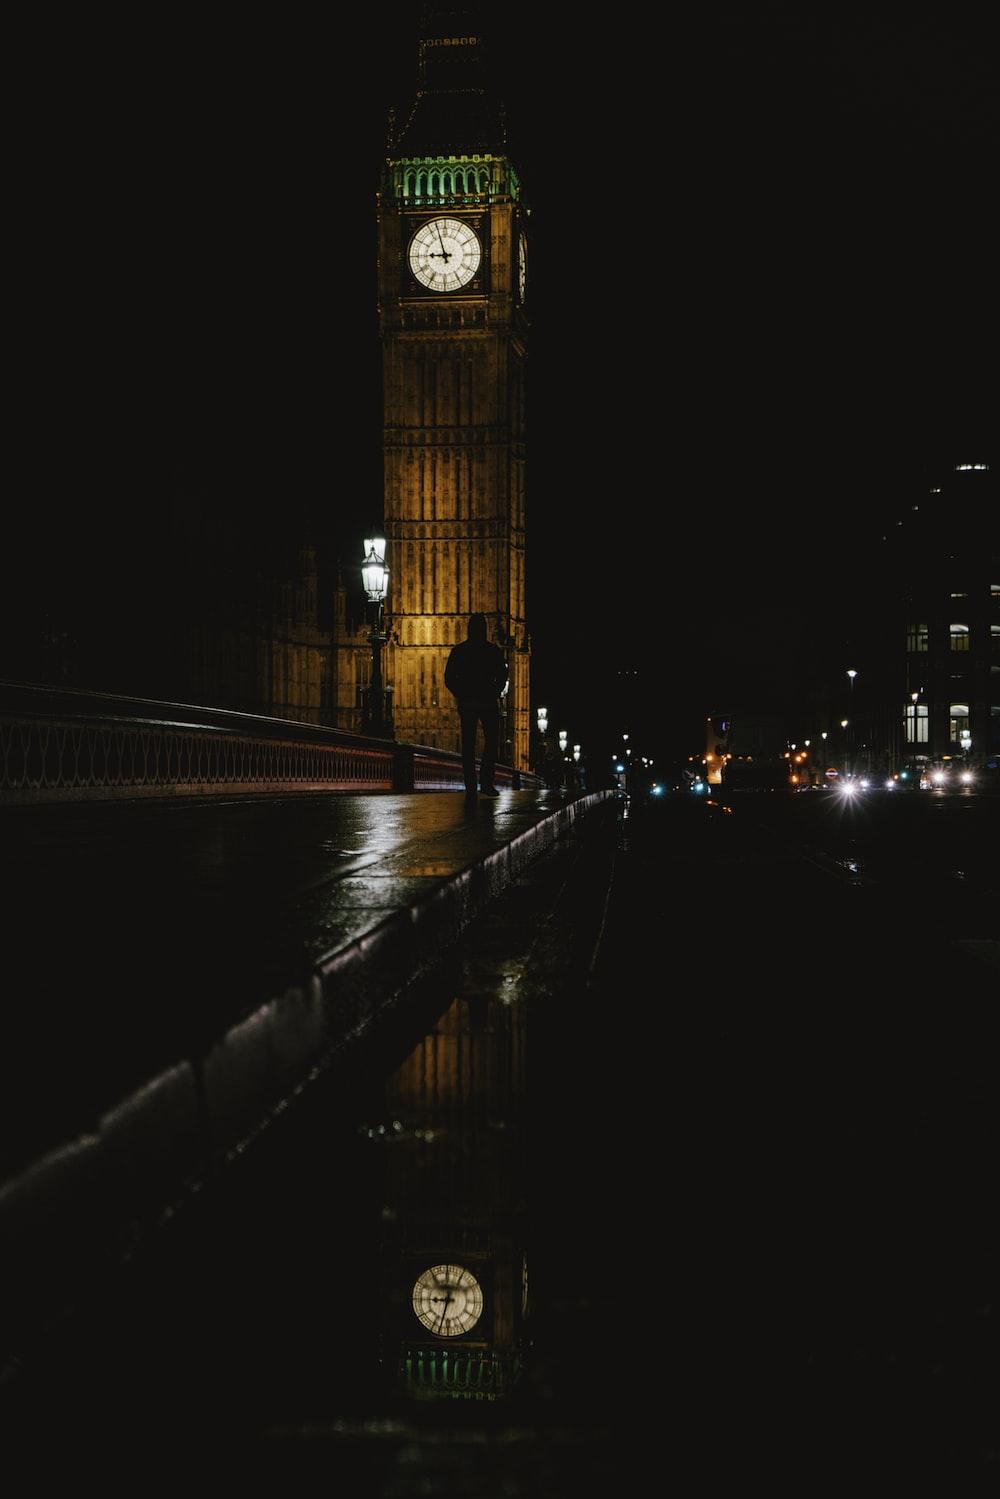 silhouette photo of man walking near Big Ben during nighttime